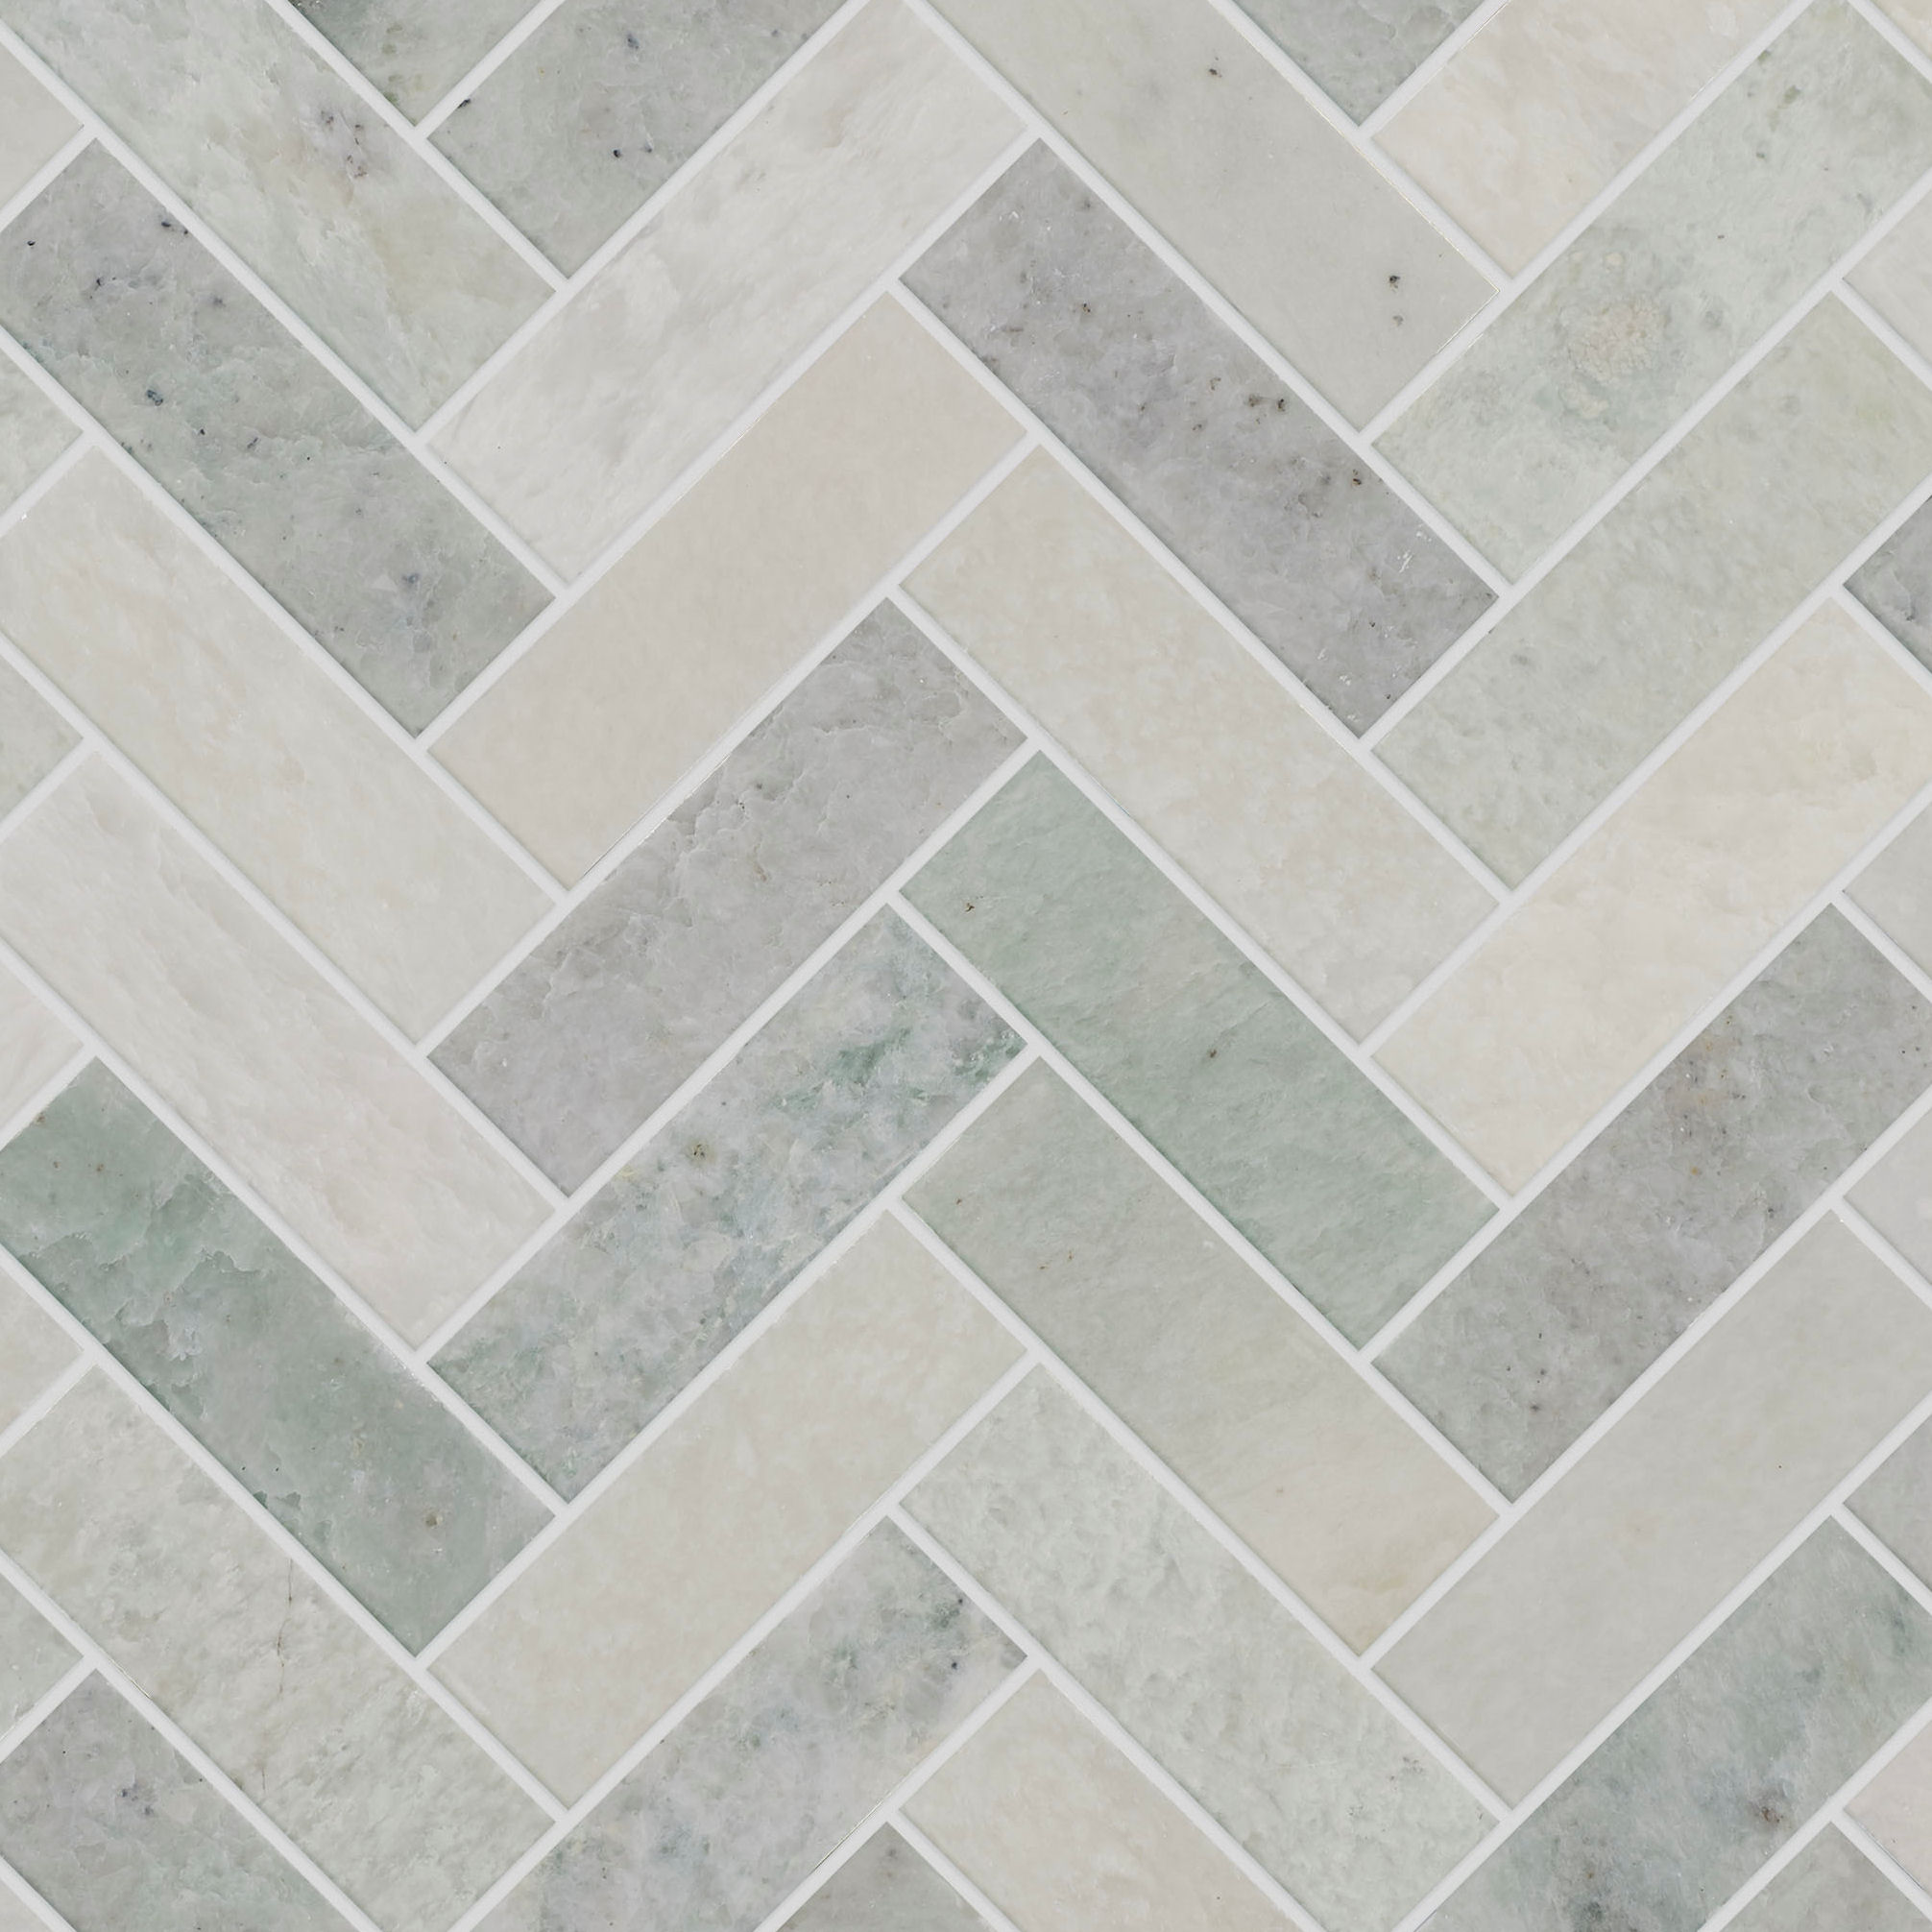 Verbena Honed Marble Herringbone Mosaic Tiles Mandarin Stone